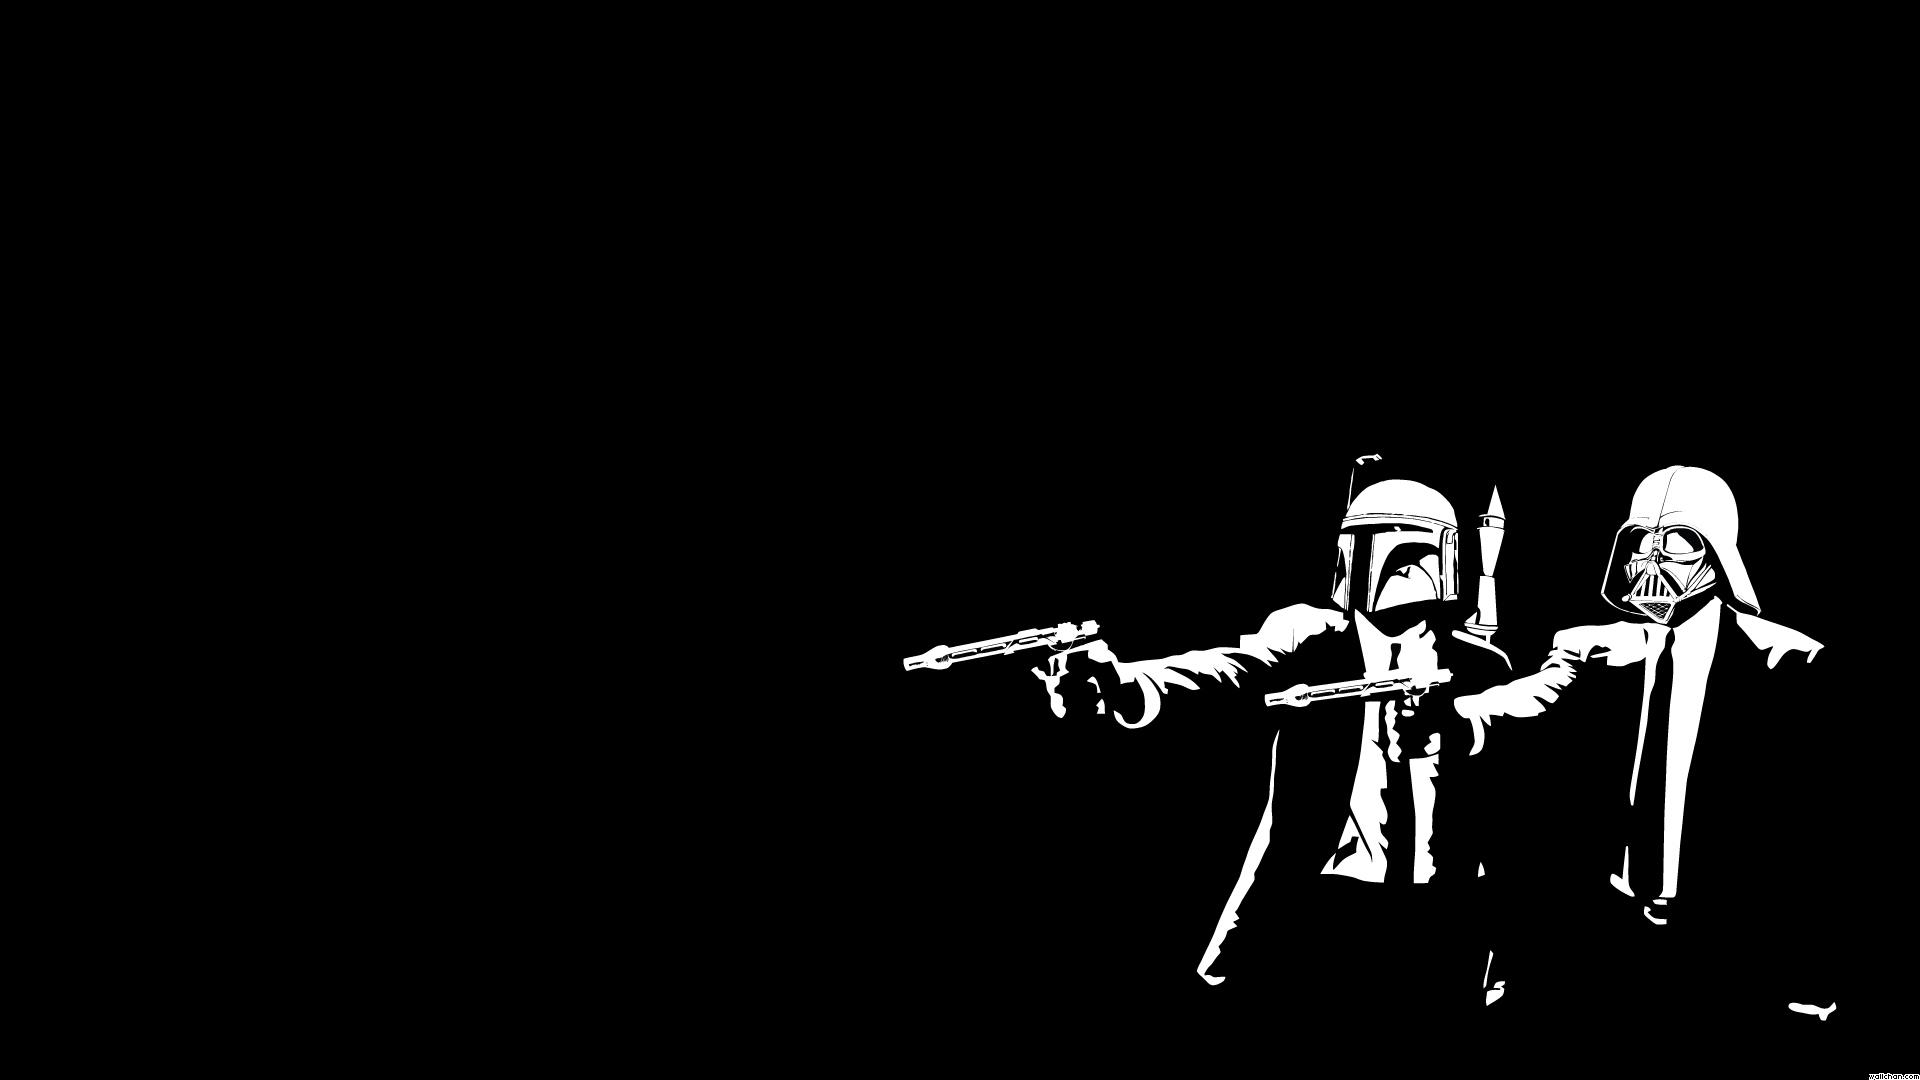 pulp fiction star wars - best movie wallpapers